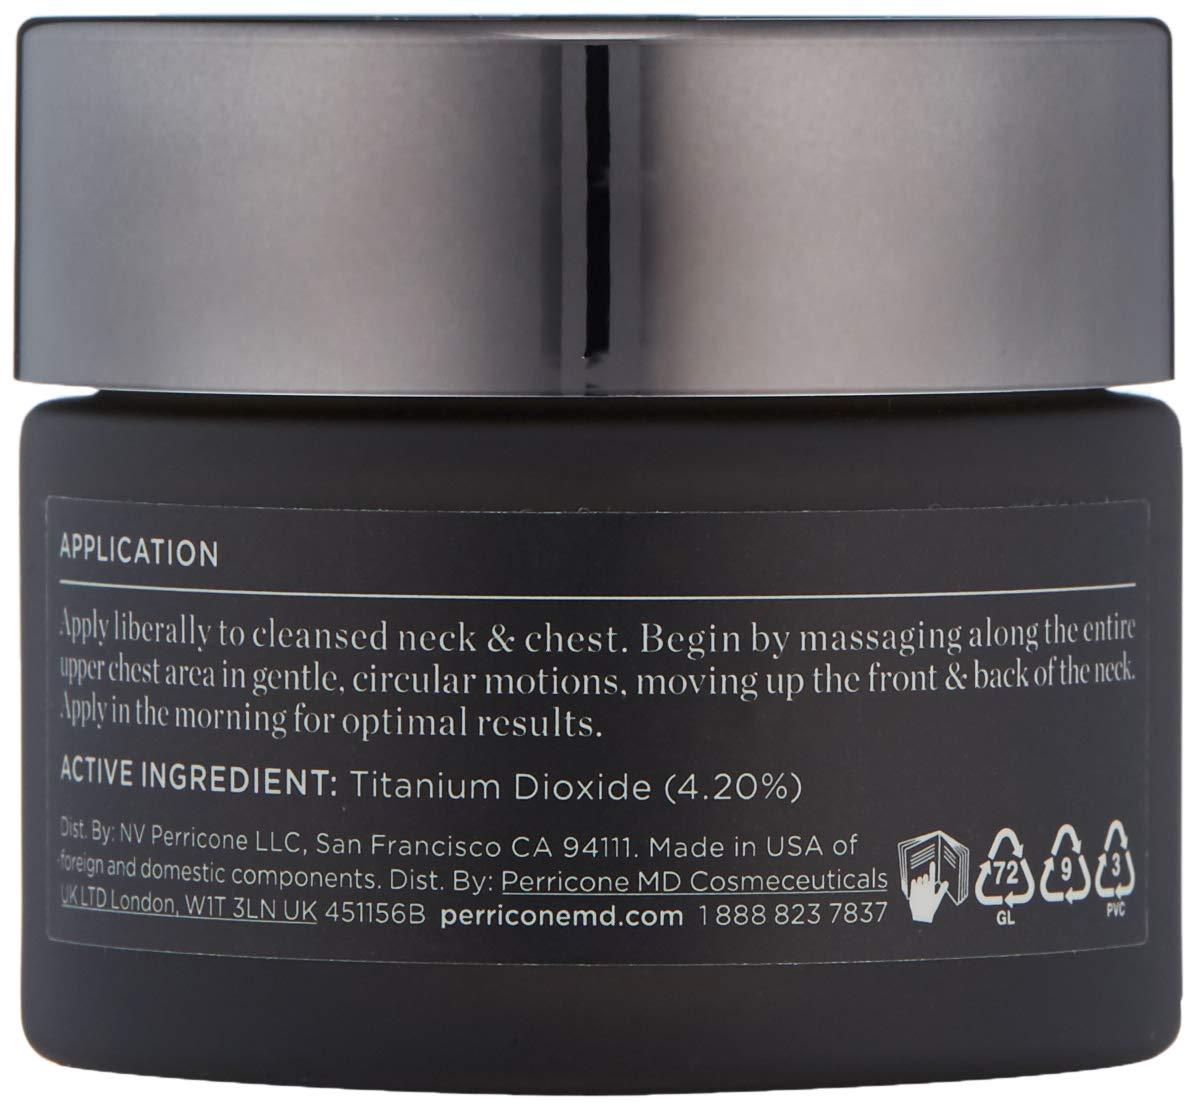 Perricone MD Cold Plasma Plus+ Neck & Chest Broad Spectrum SPF 25 1 Oz: Premium Beauty